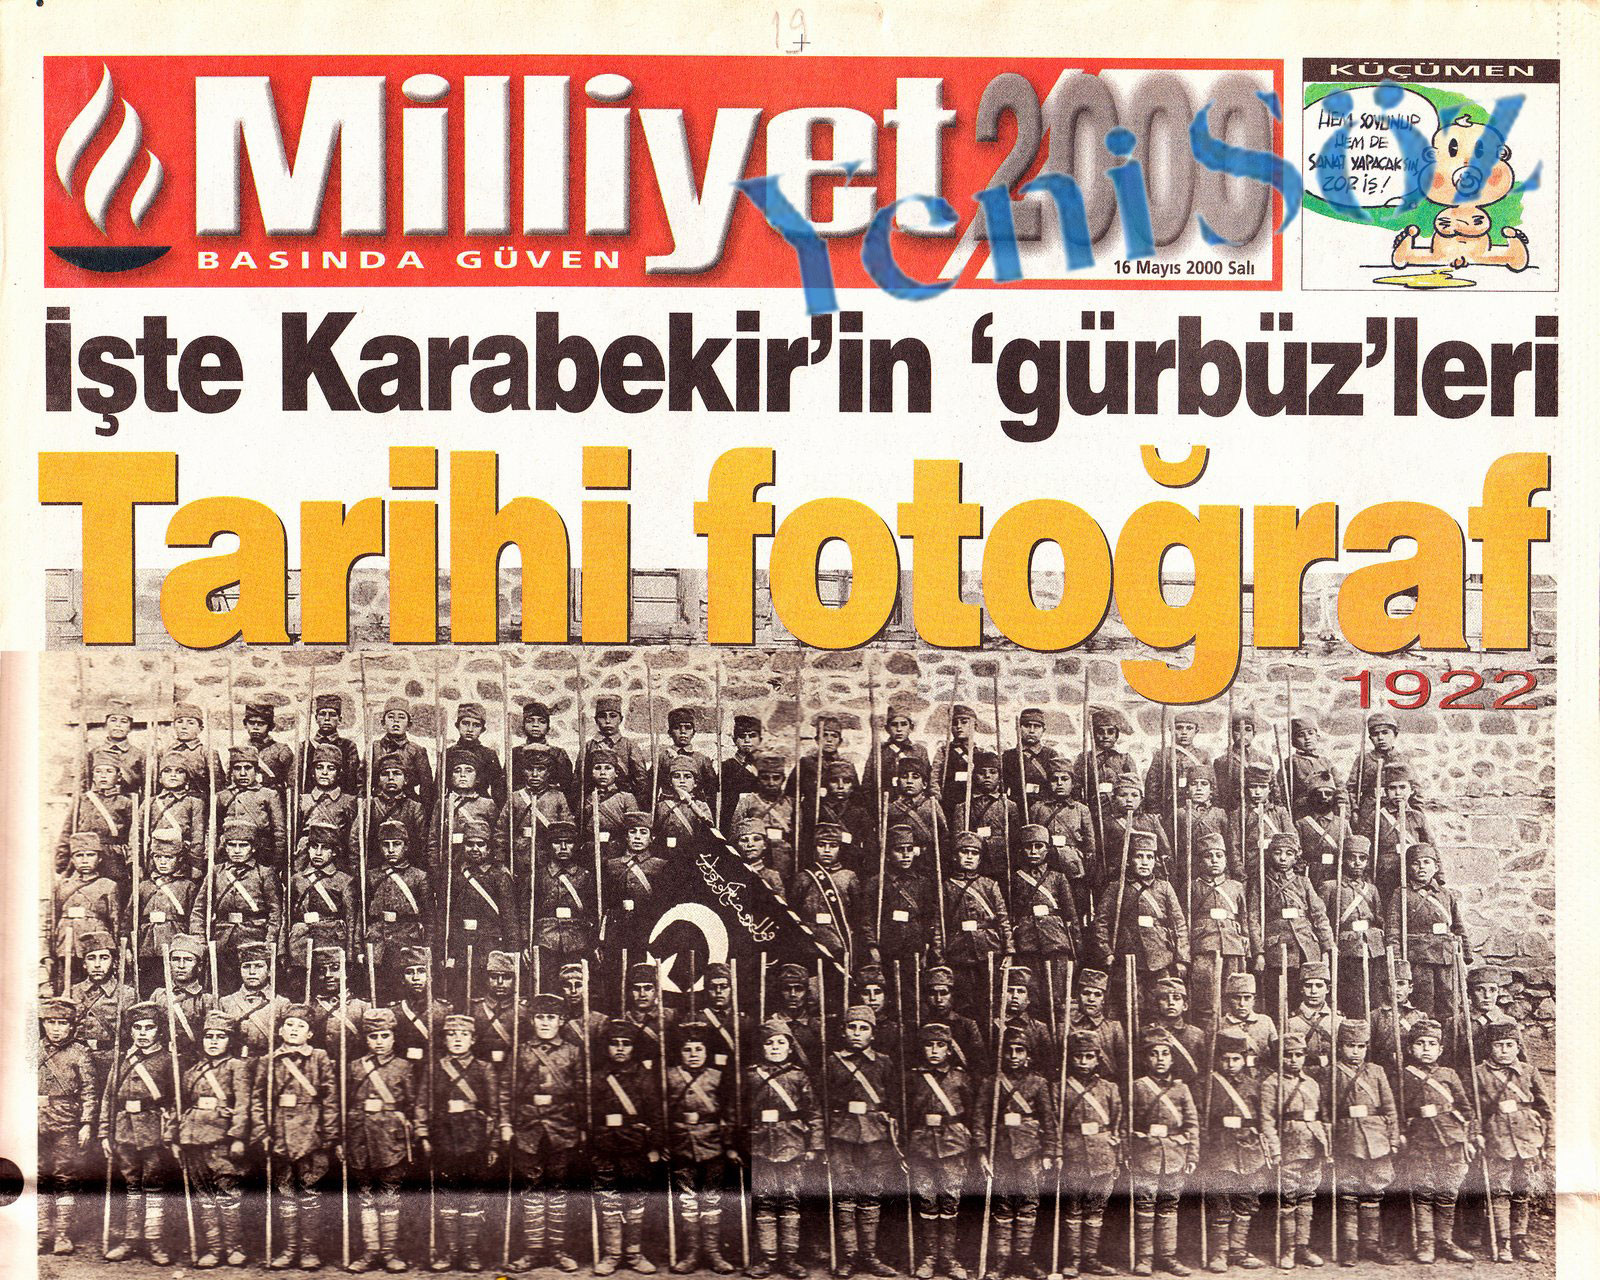 KazimKarabekir_Gurbuzler-1